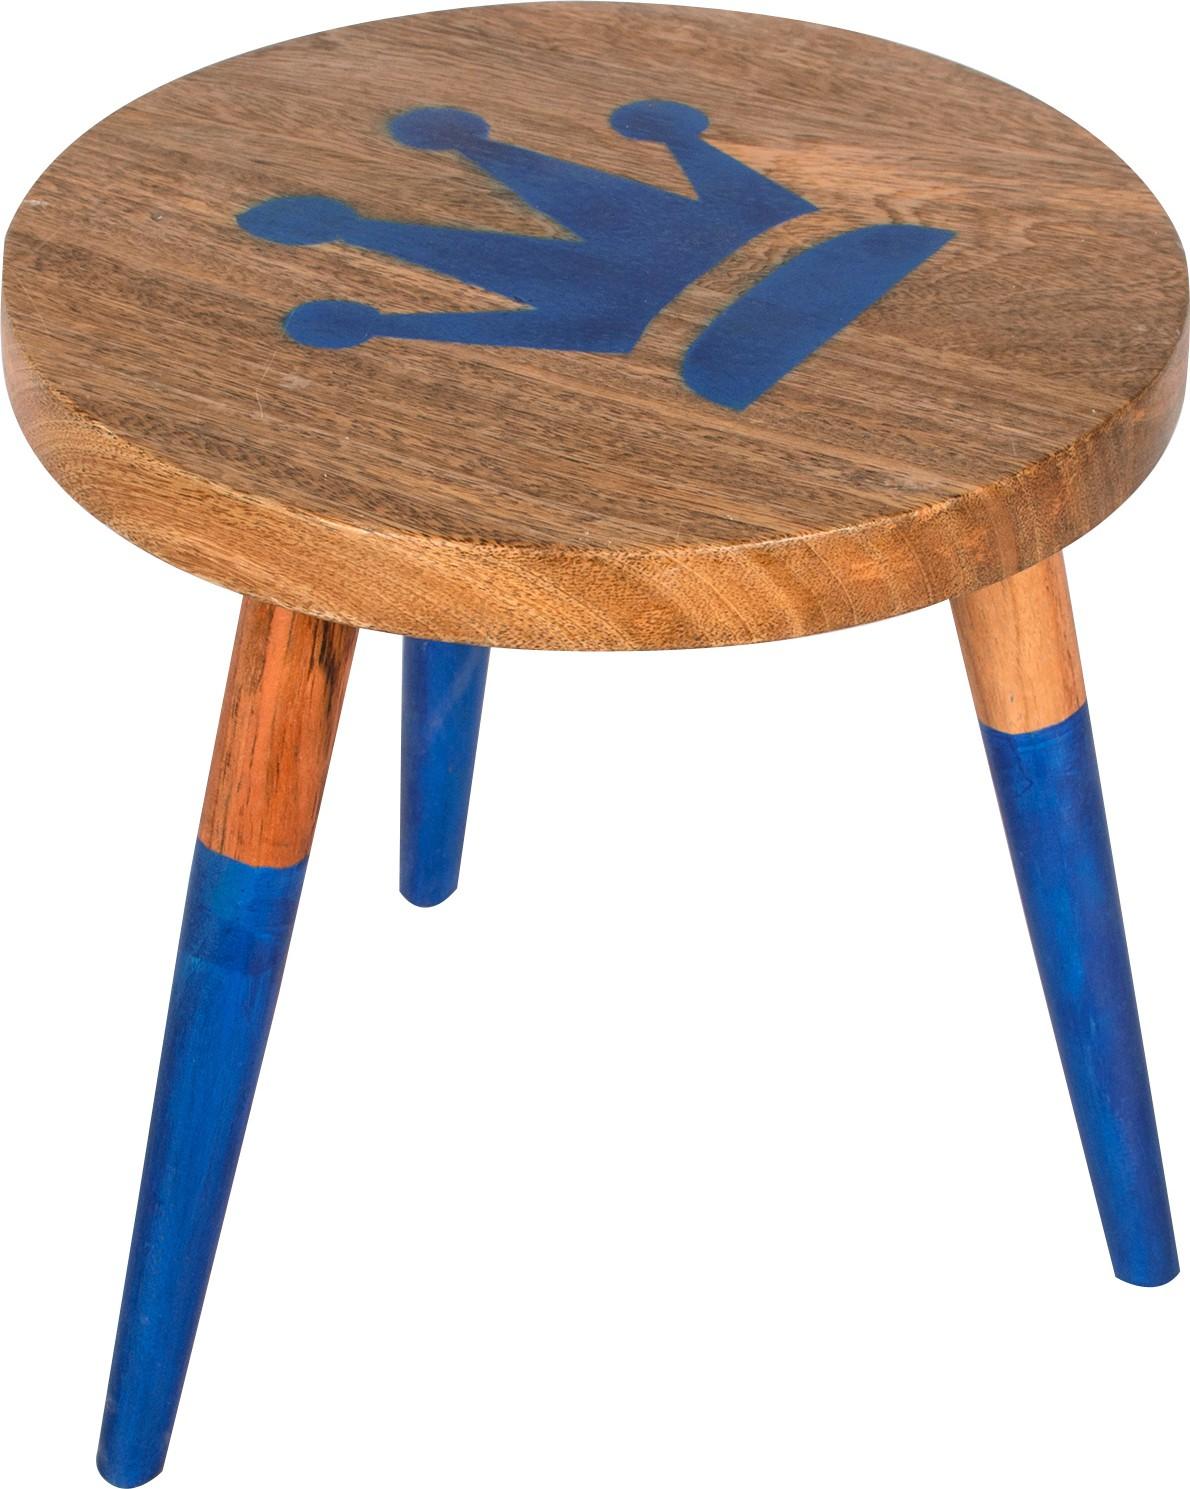 View Hastkala Solid Wood Stool(Finish Color - Brown) Furniture (Hastkala)